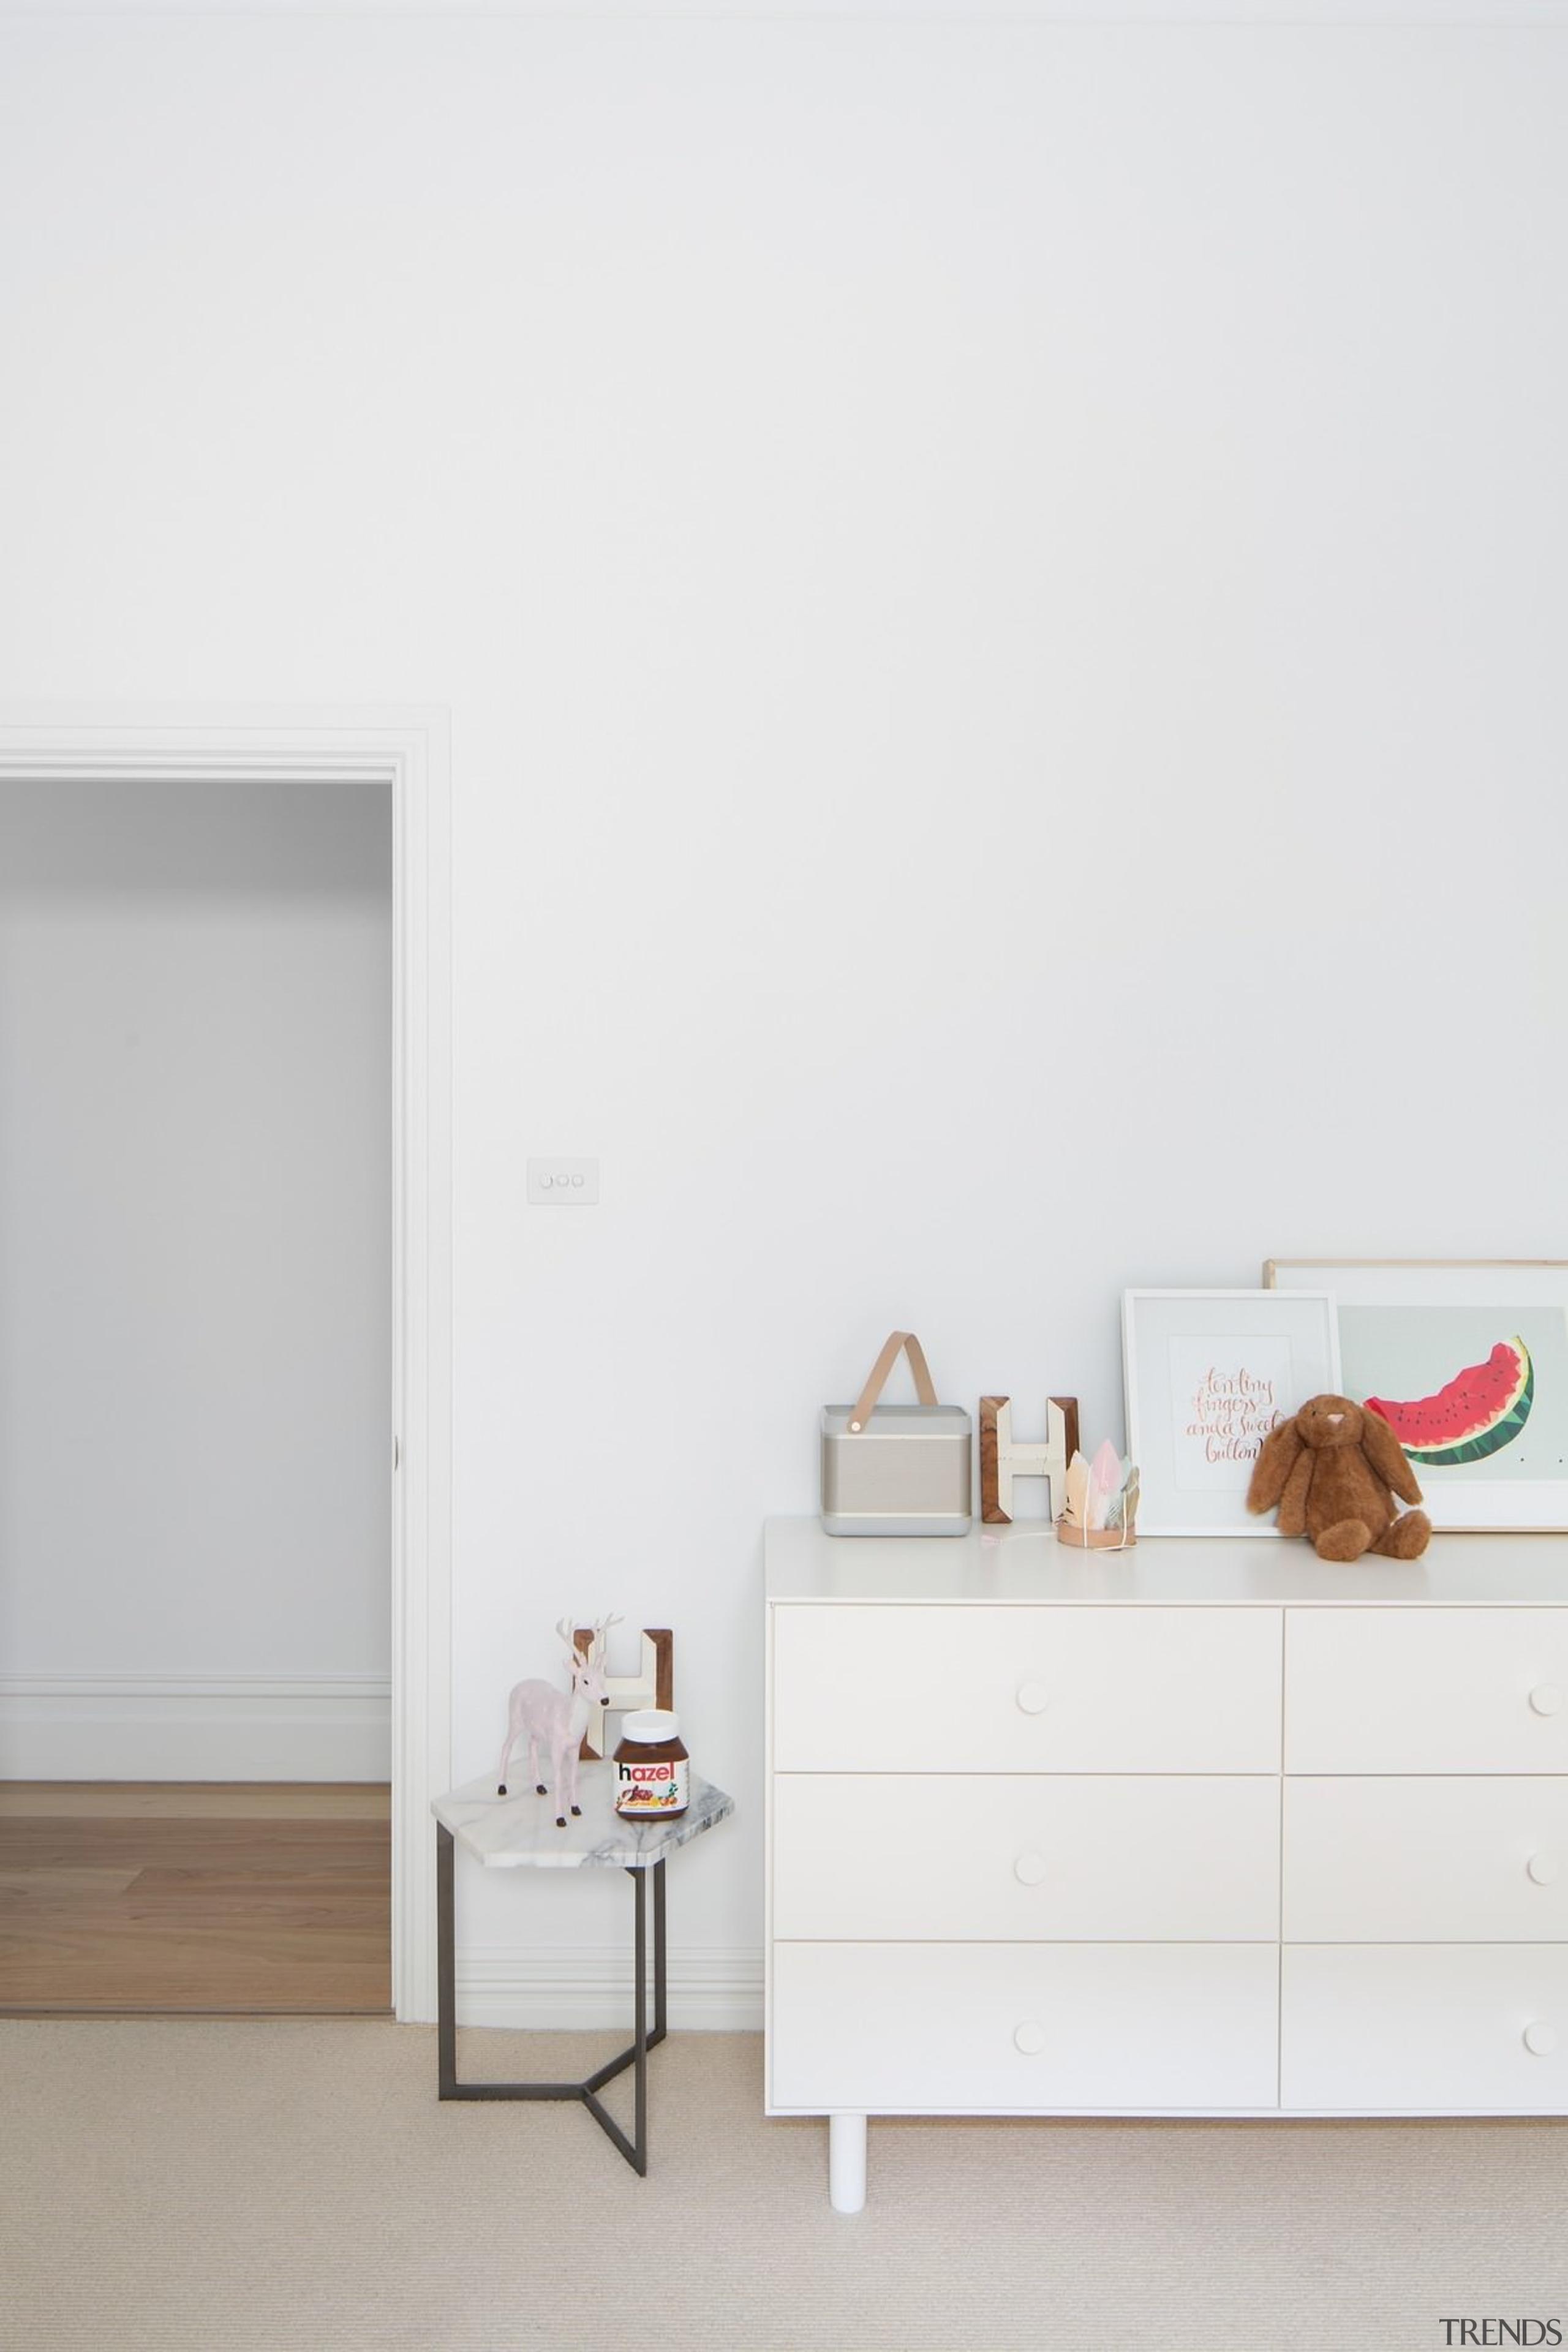 Hardwood floors are hard to beat - Hardwood floor, furniture, home, house, interior design, product design, shelf, shelving, table, wall, white